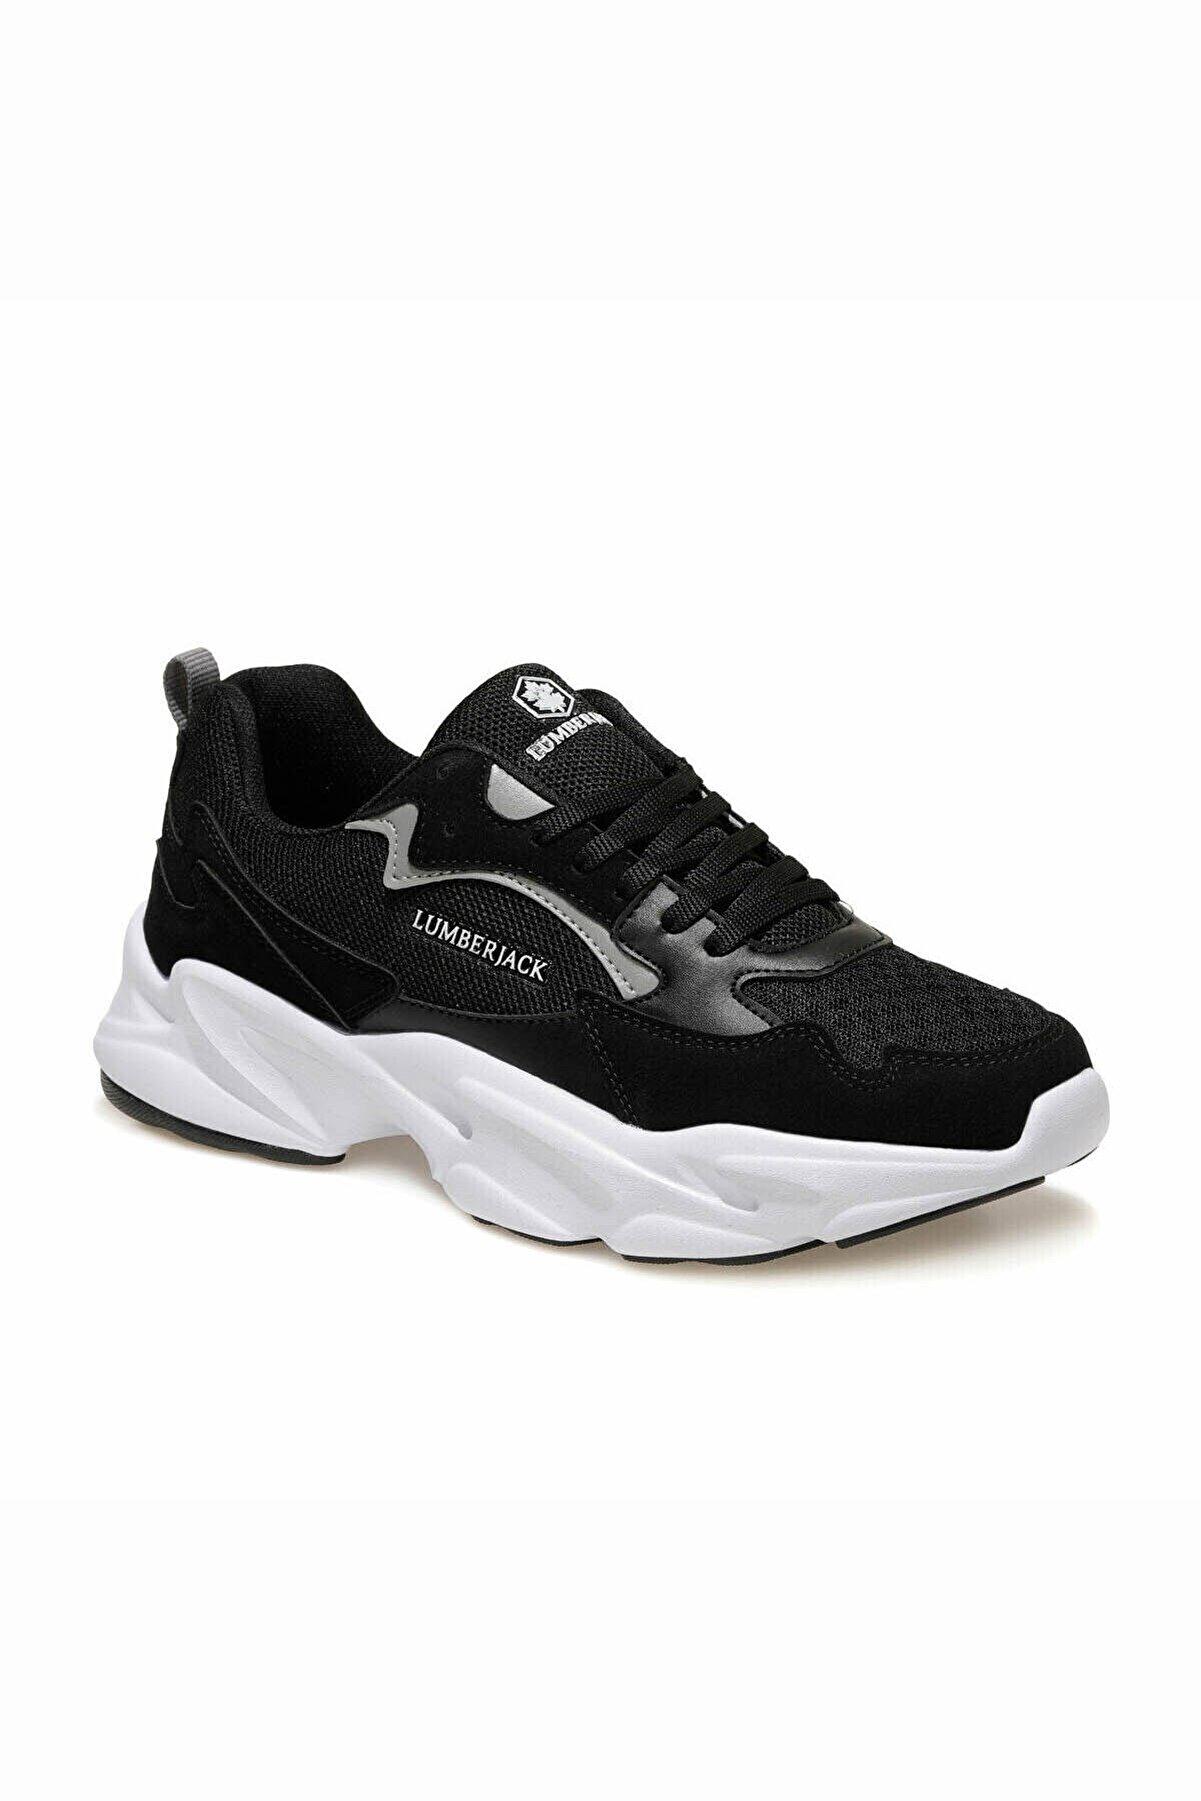 Lumberjack KHAN 1FX Siyah Erkek Sneaker Ayakkabı 100785440